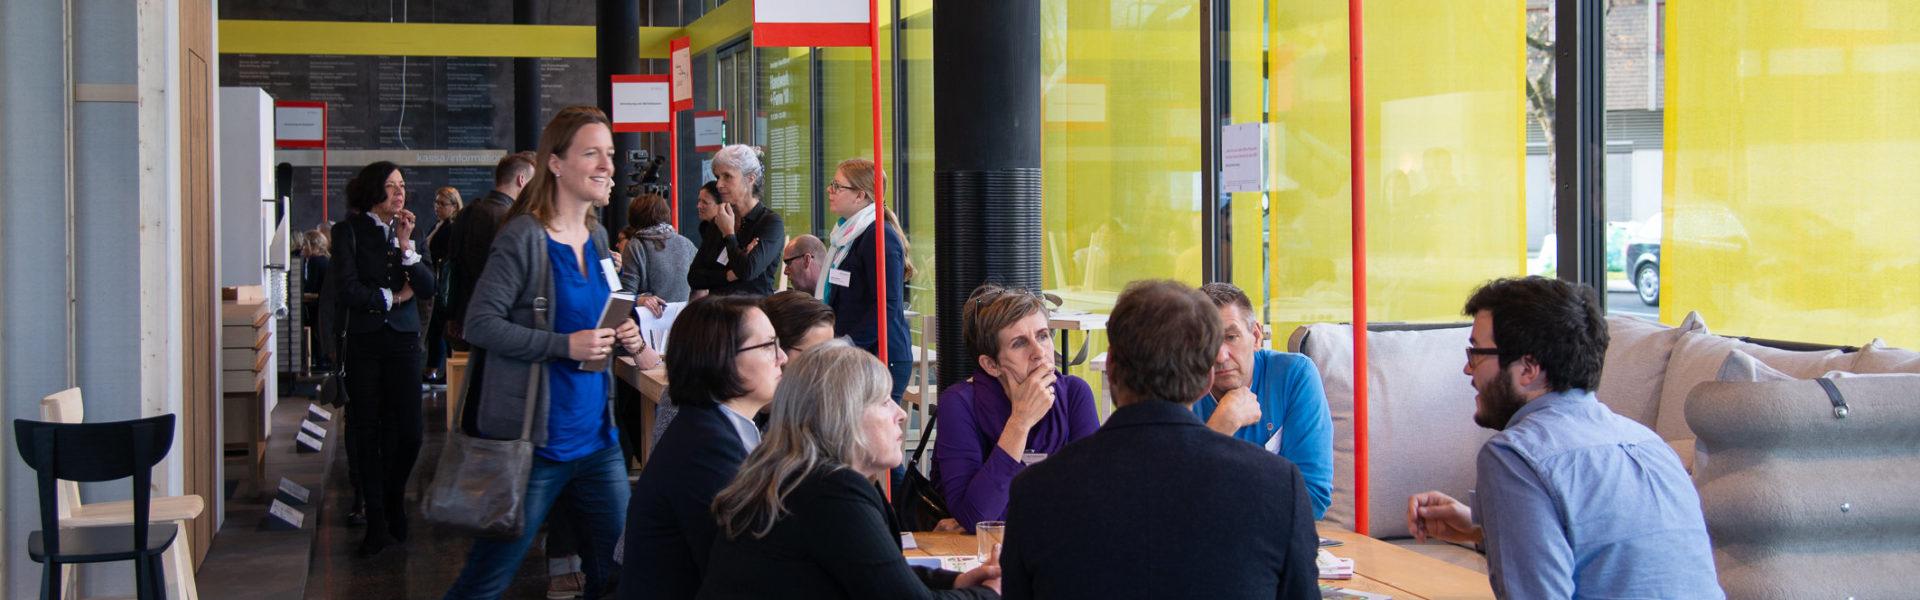 GVA Symposion 2018 © Vorarlberg Tourismus